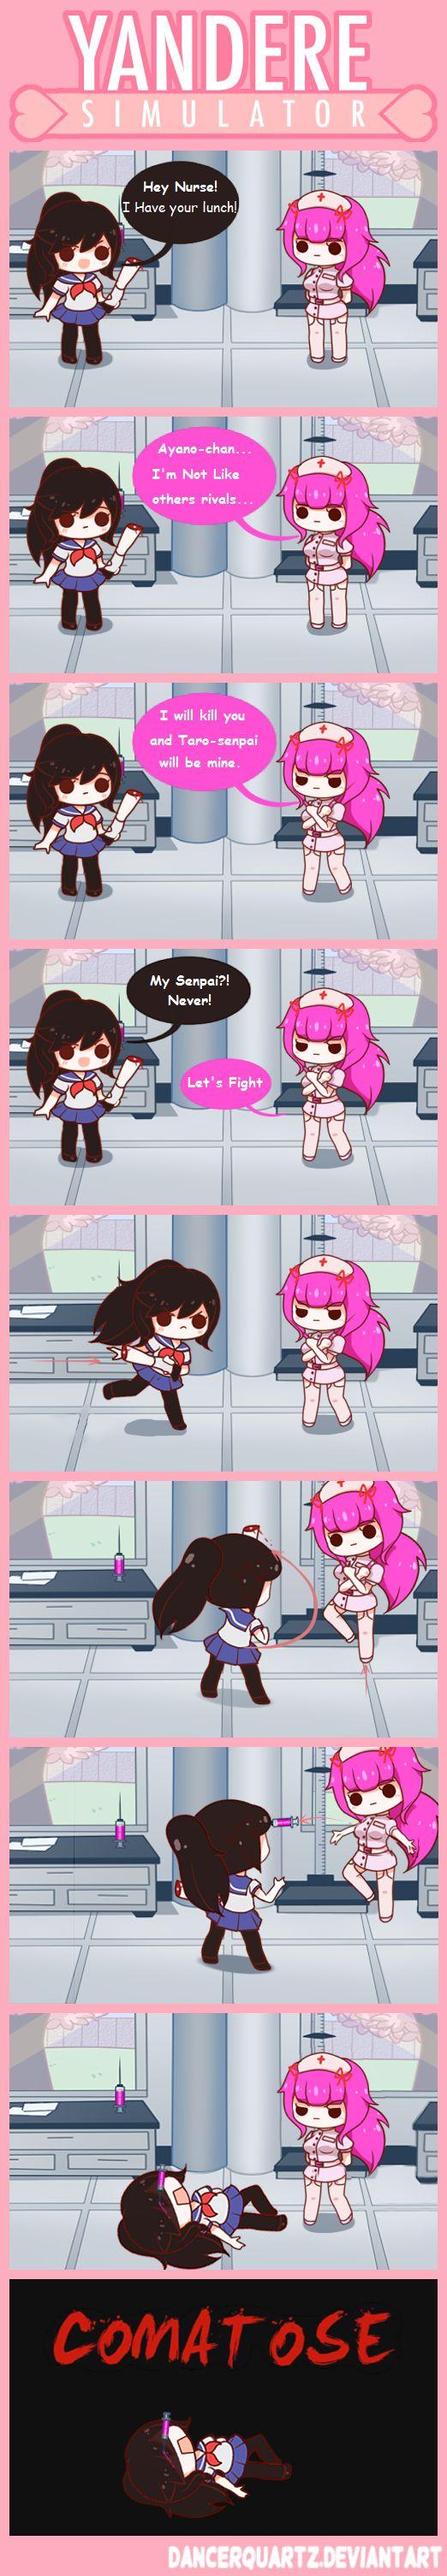 Game development blog yandere classmates anime pinterest nice - Yandere Comic Yandere Chan Vs The Nurse By Dancerquartz On Deviantart